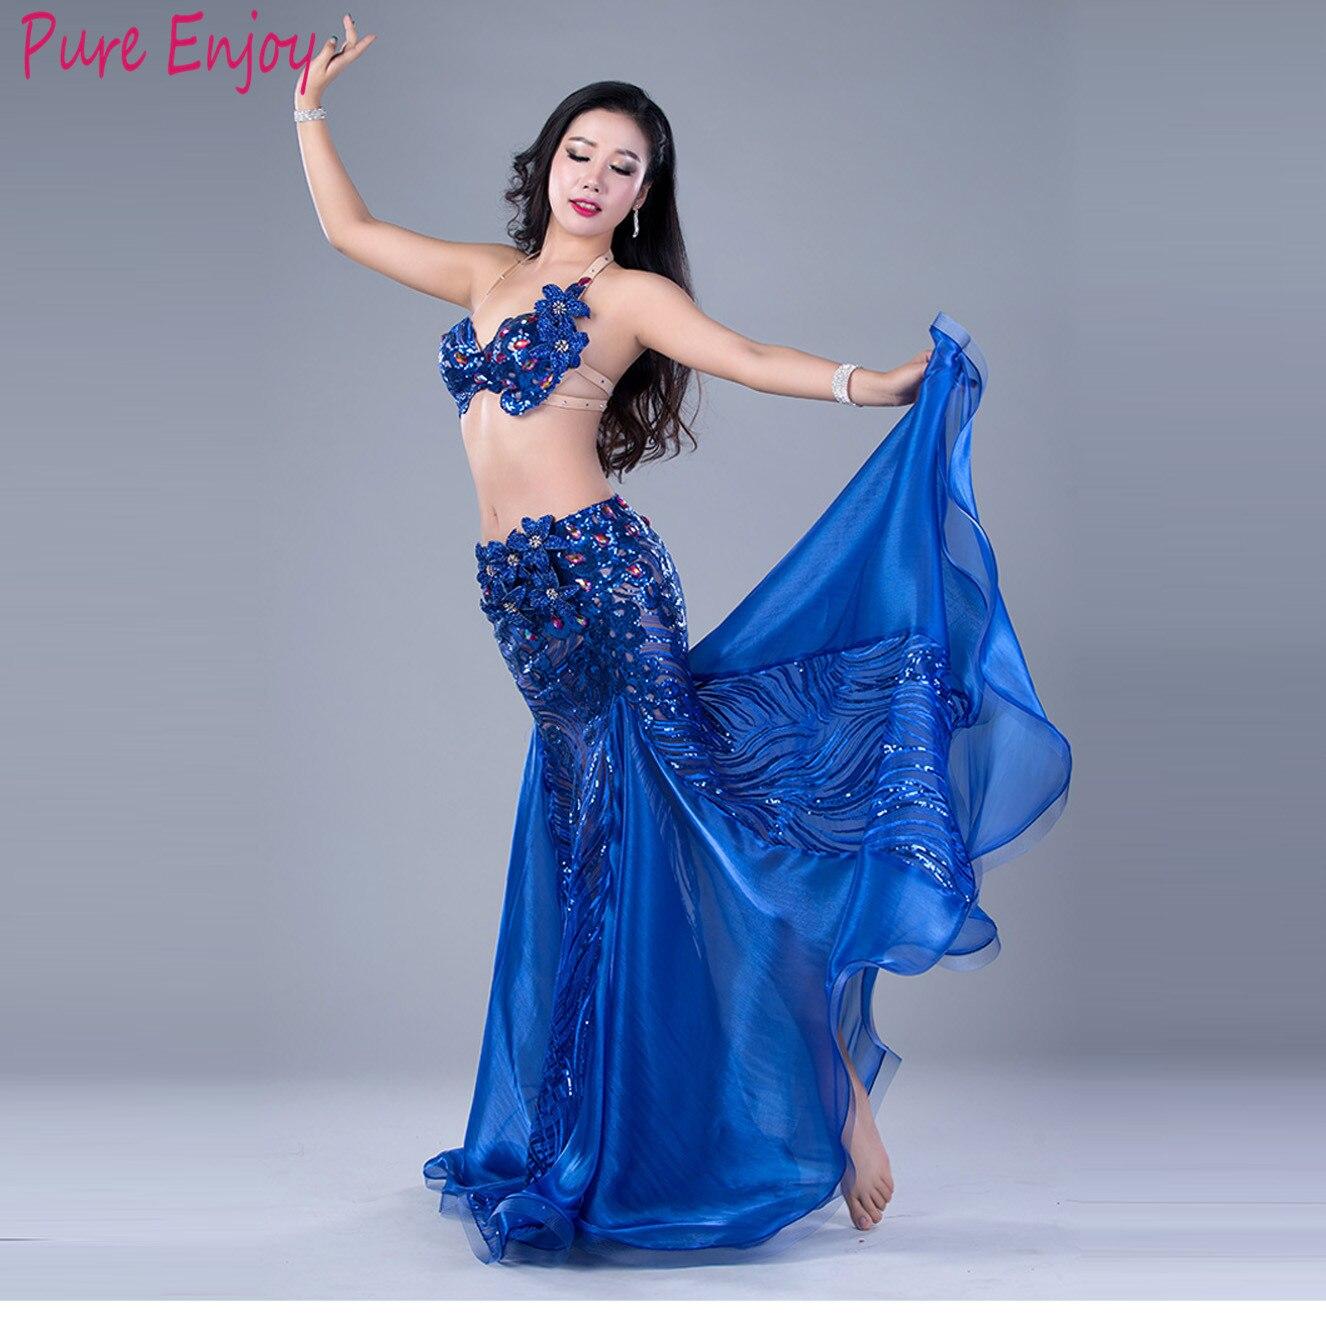 2020 Women Belly Dance Performance Outfit New Sexy Diamond Fishtail Dress Summer Dance Performance Clothing Bra+long Skirt 2pcs